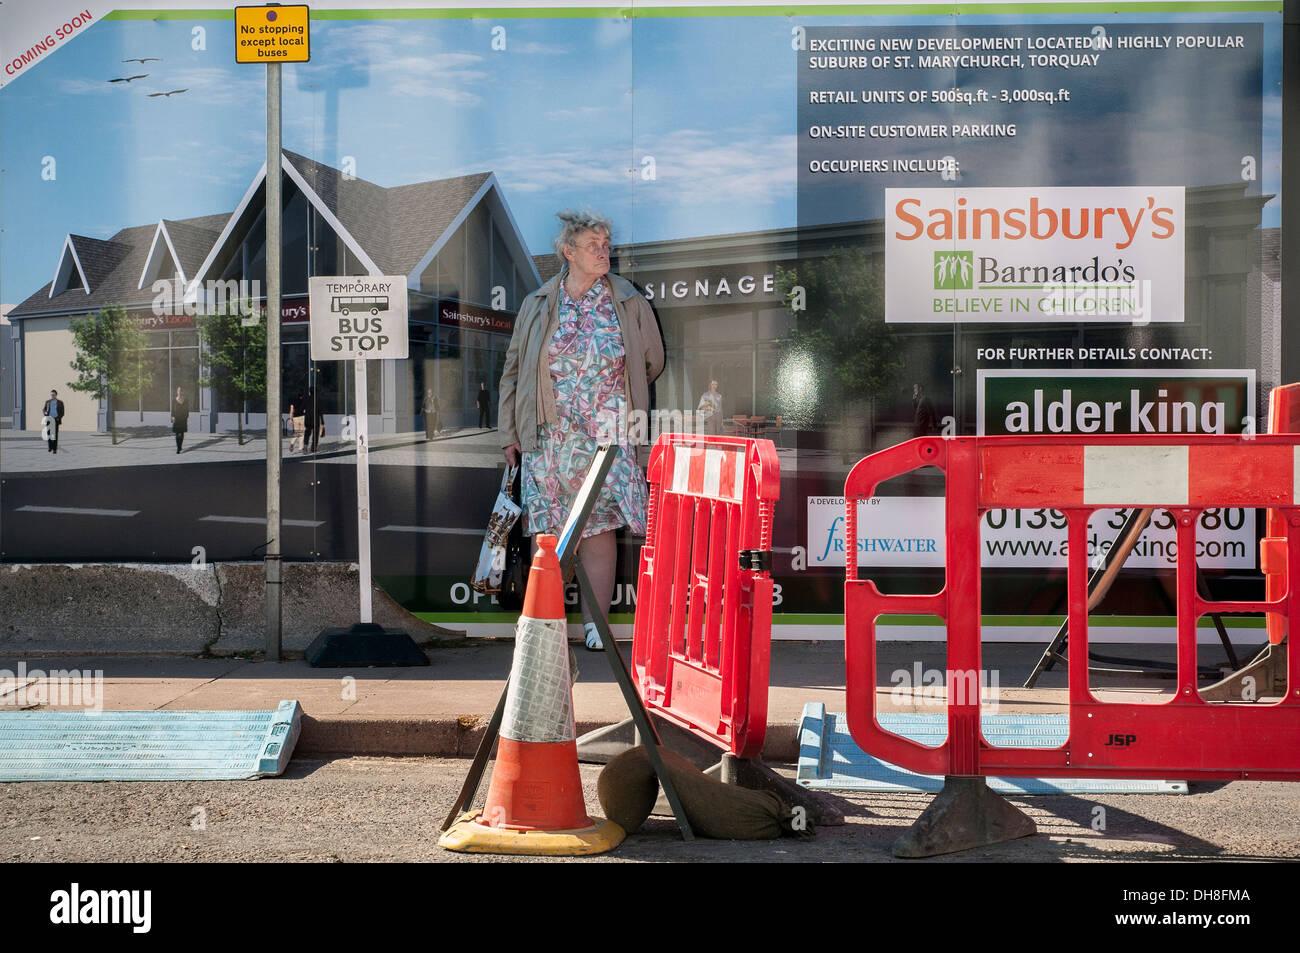 Sainsburys,alder king,street furniture,cones, - Stock Image